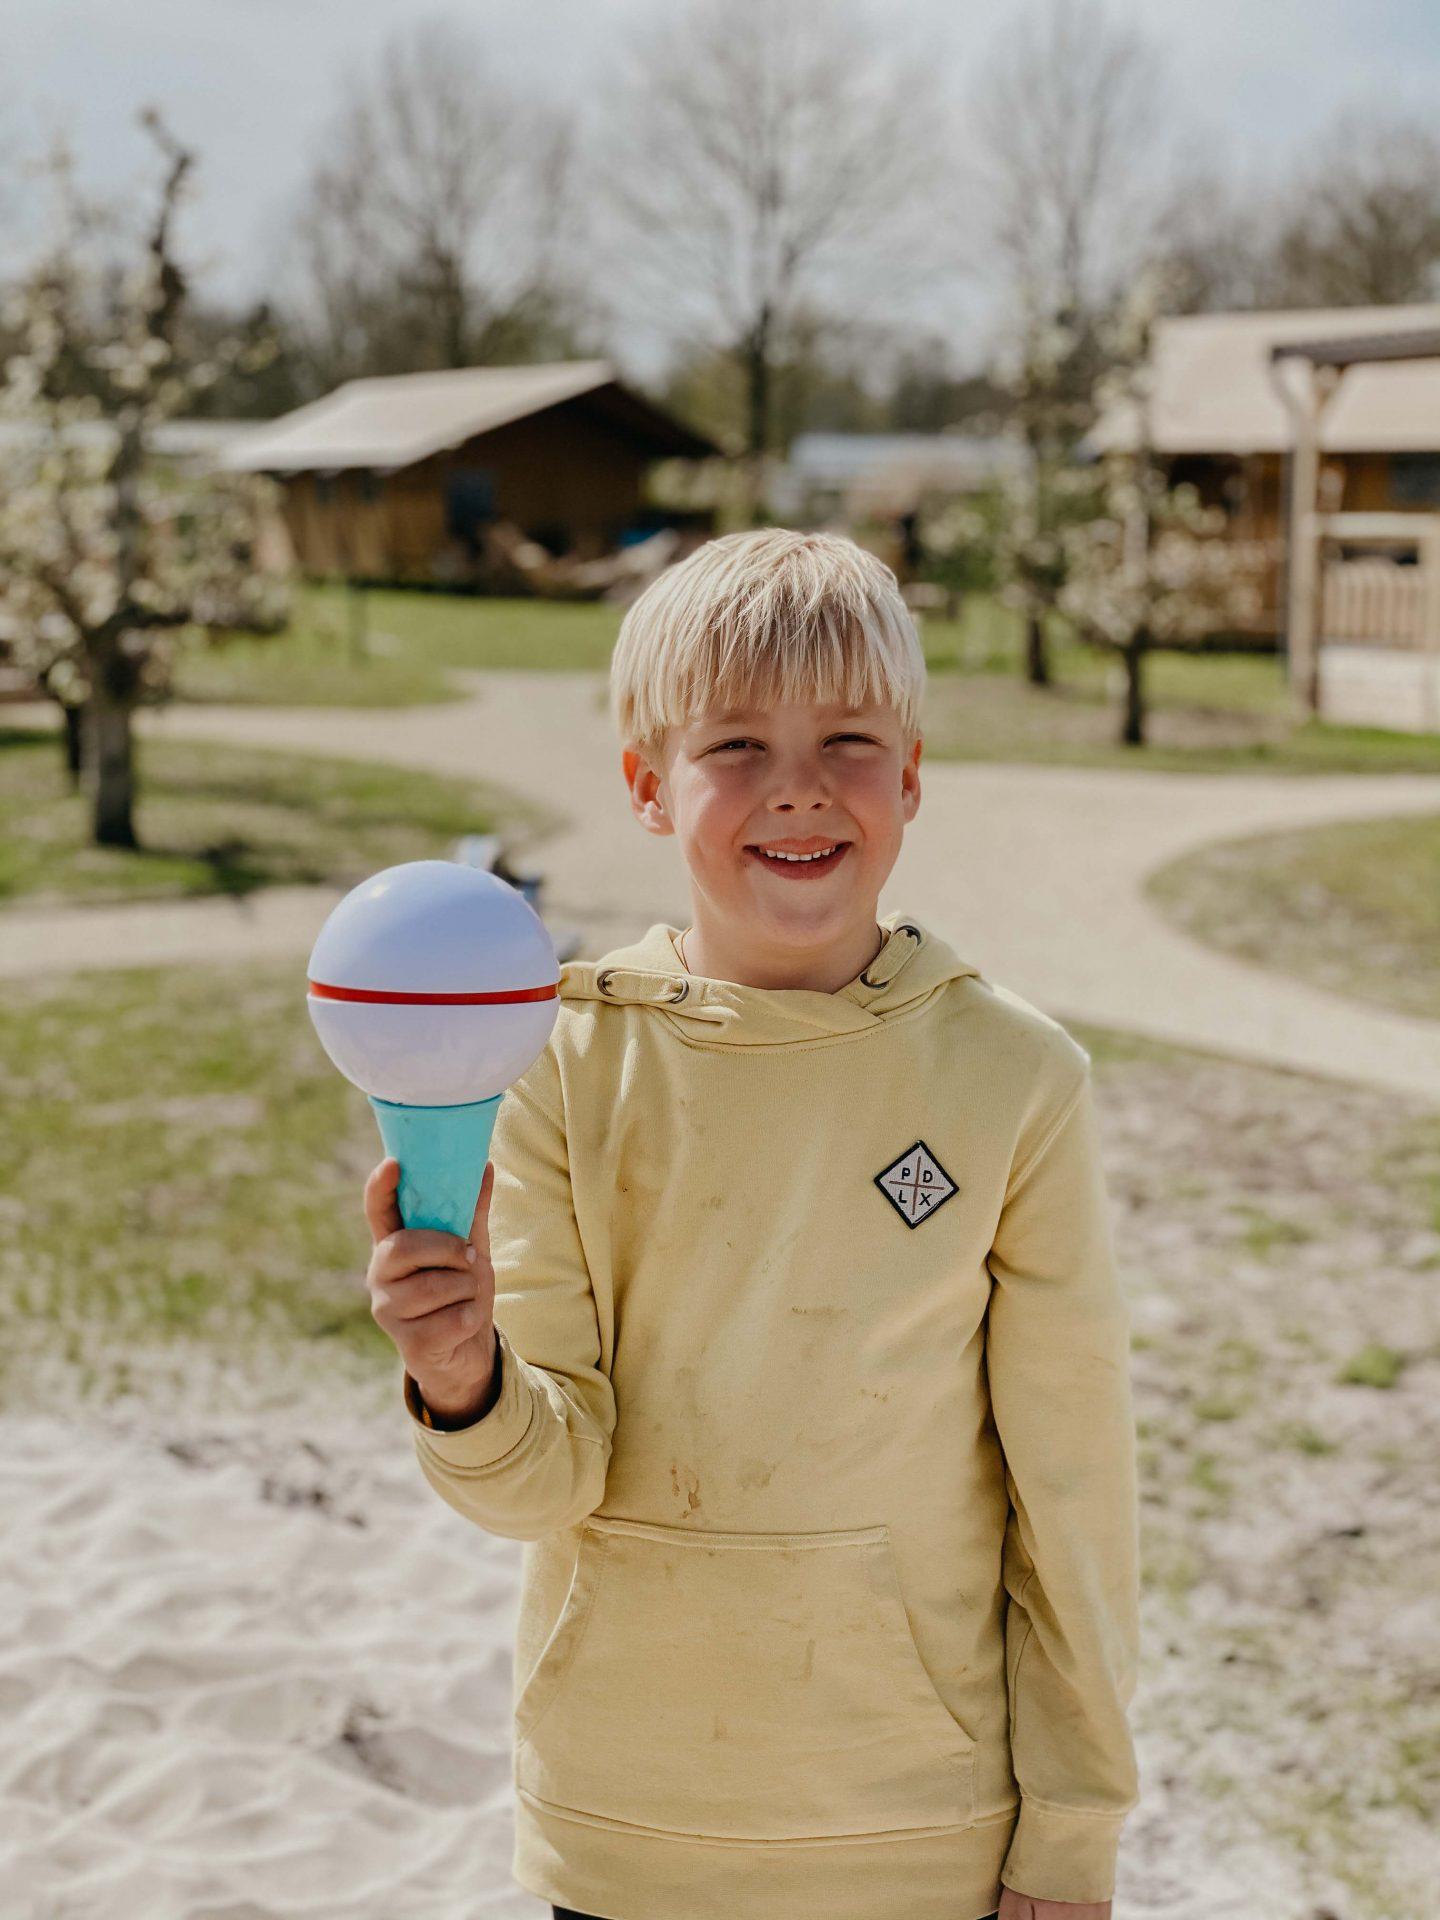 kindvriendelijke camping de vinkenkamp veluwe